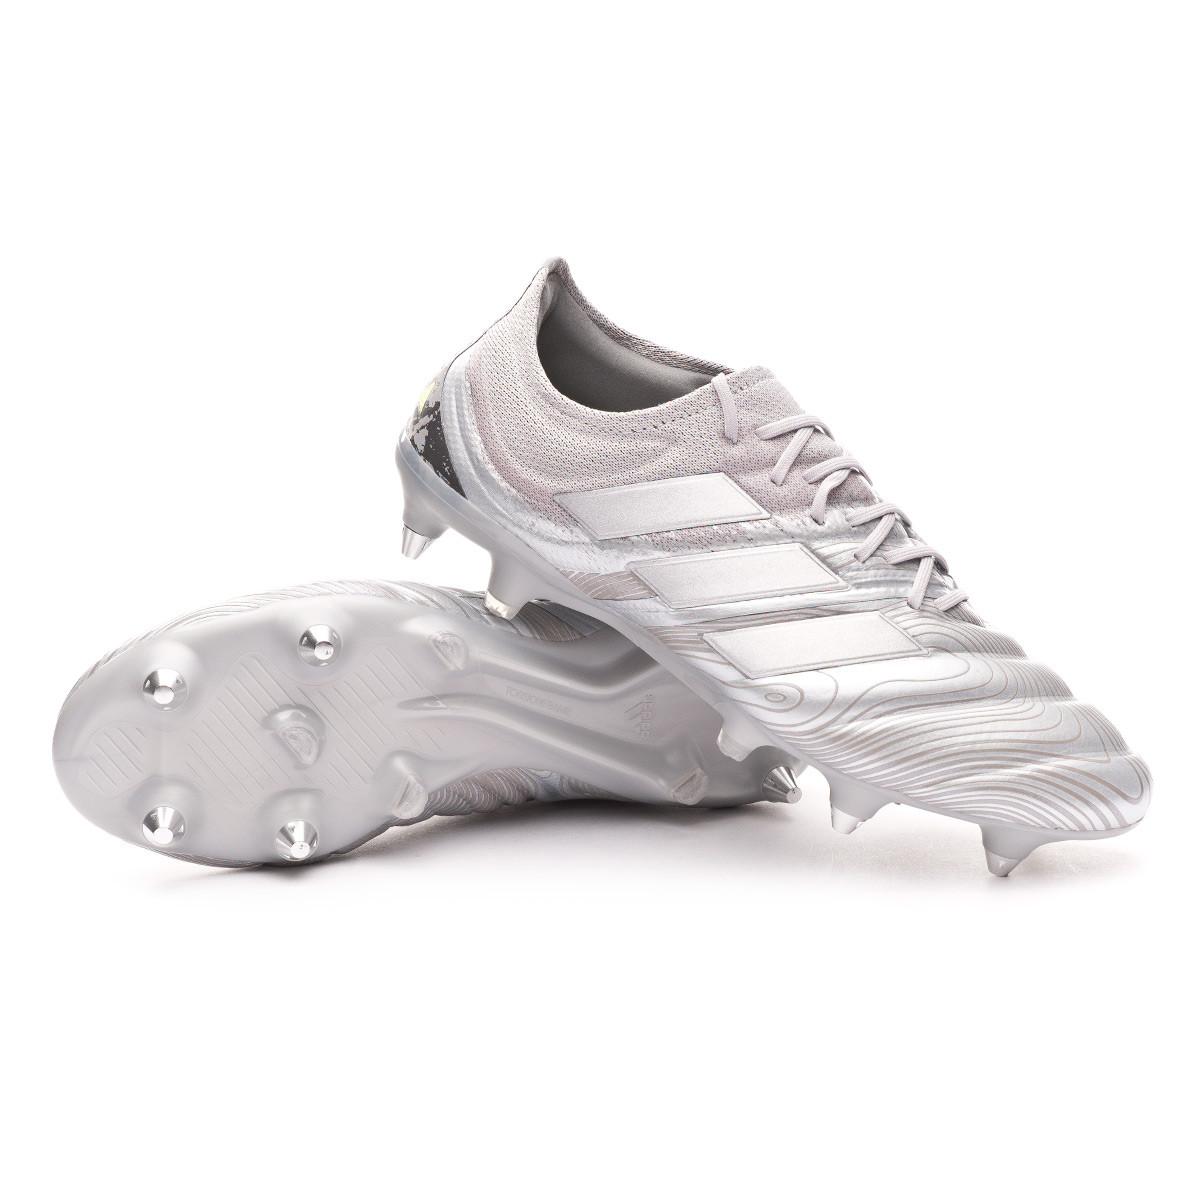 Football Boots adidas Copa 20.1 SG